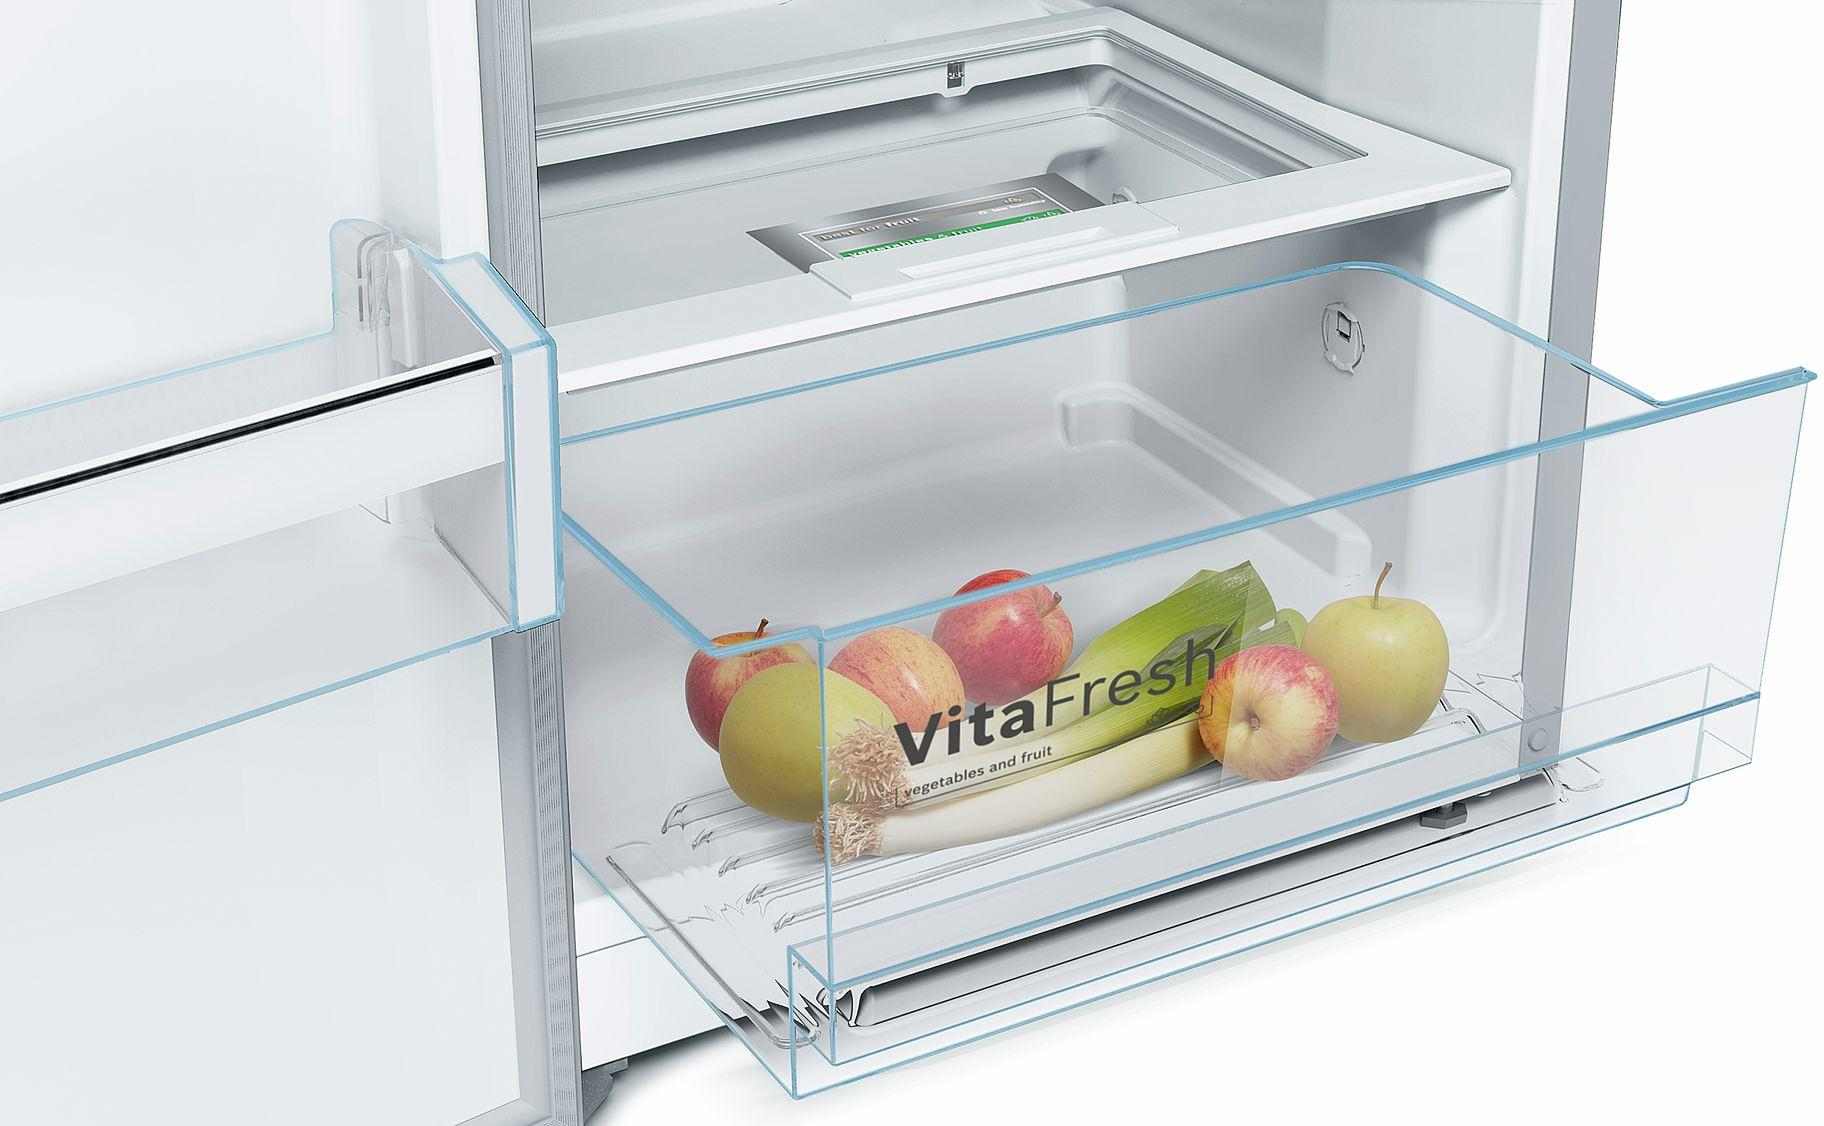 Bosch Kühlschrank Vergleich : Bosch ksv vl p a kühlschrank freshsense super kühlen